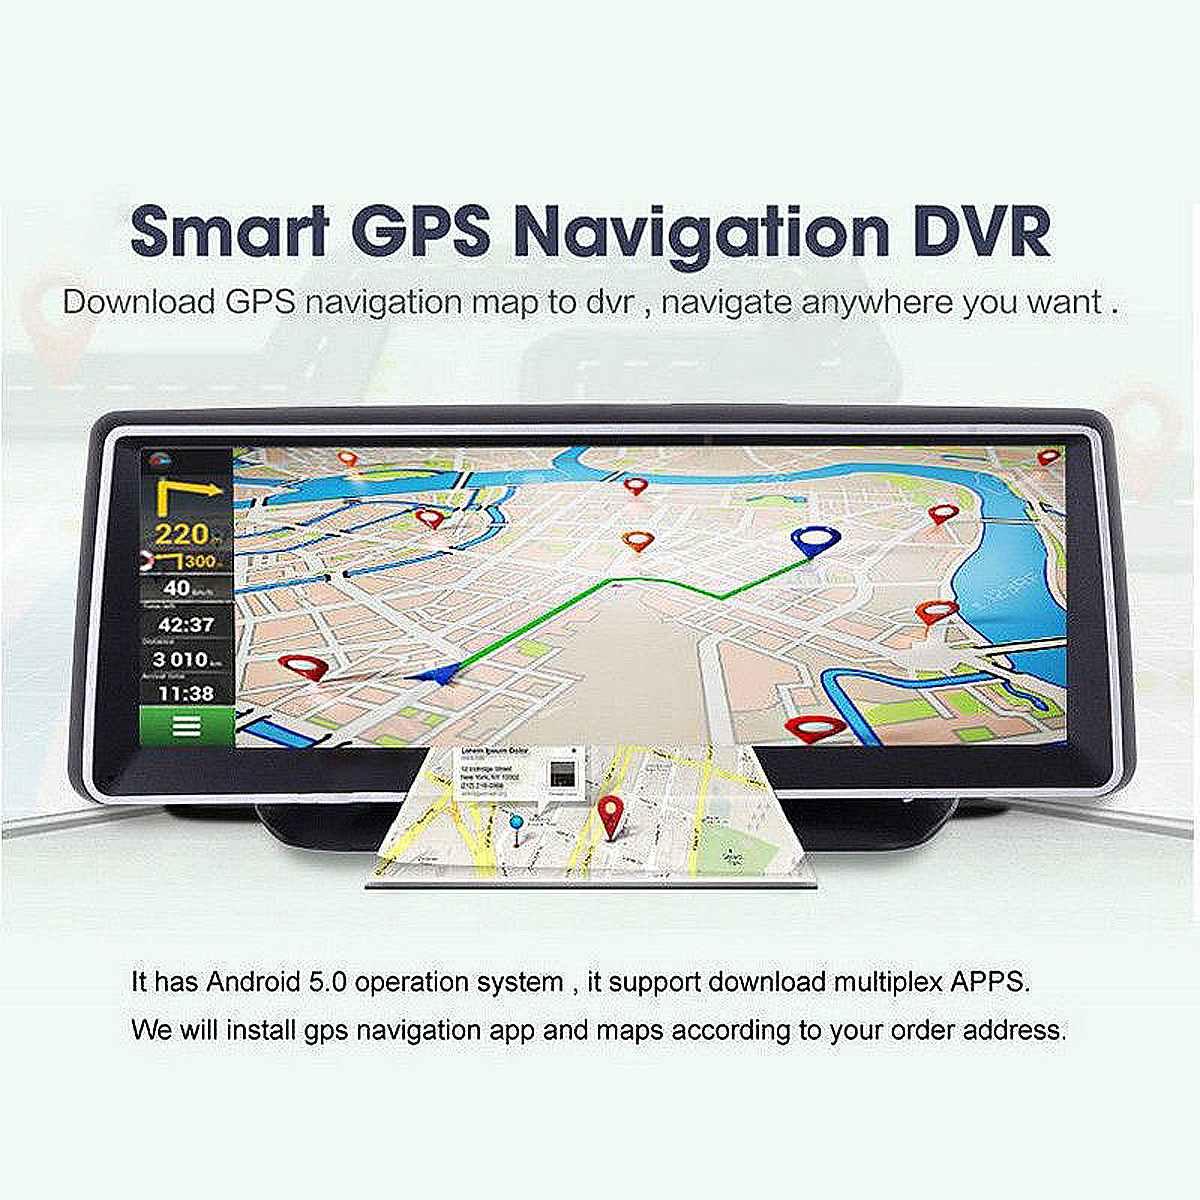 8 inch Double lens HD Car GPS Navigation navigator Android FM Video camera  bluetooth Map Sat nav Truck gps navigators automobile